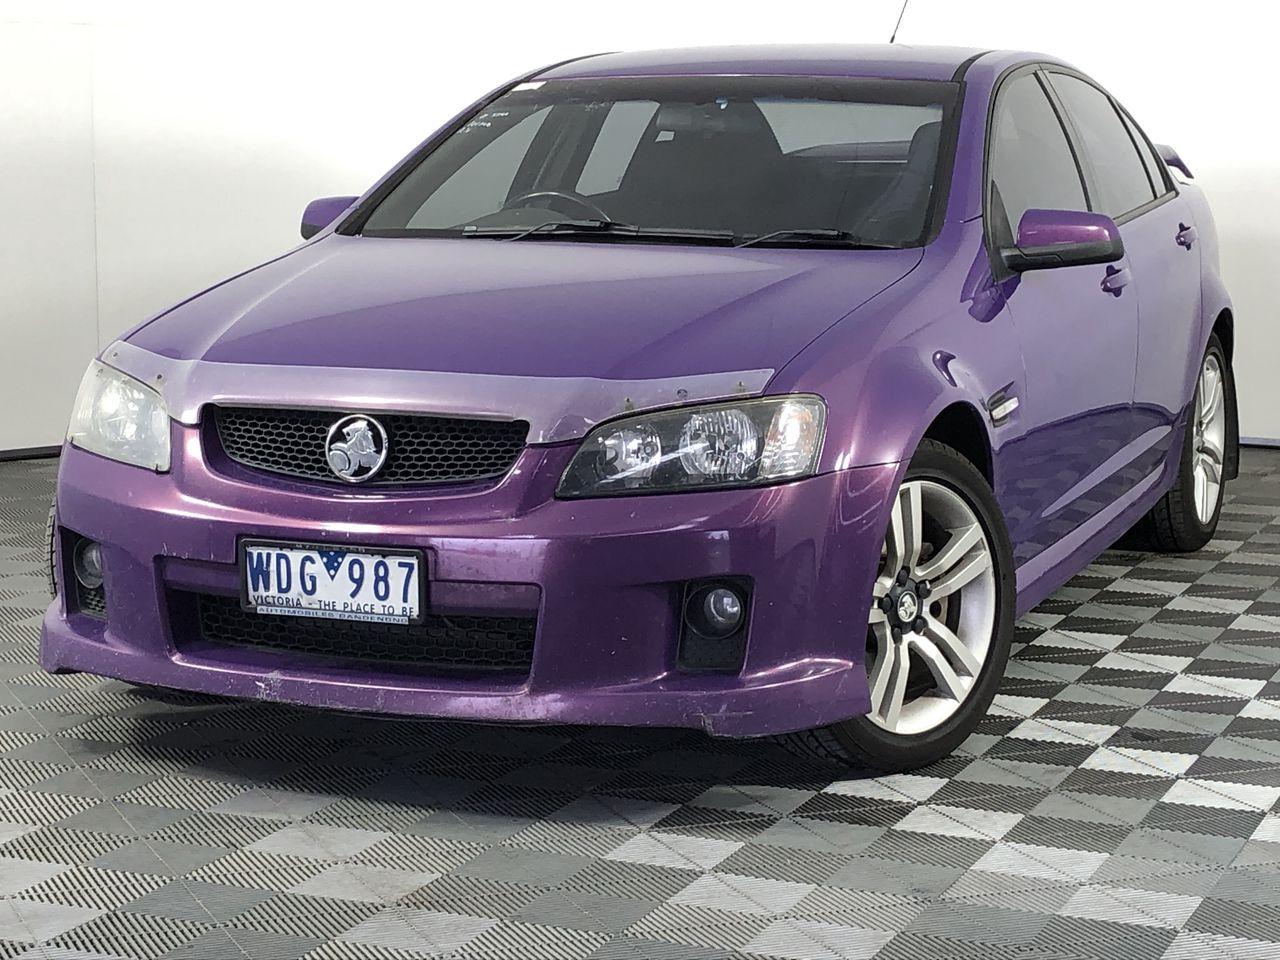 2007 Holden Commodore SV6 VE Automatic Sedan